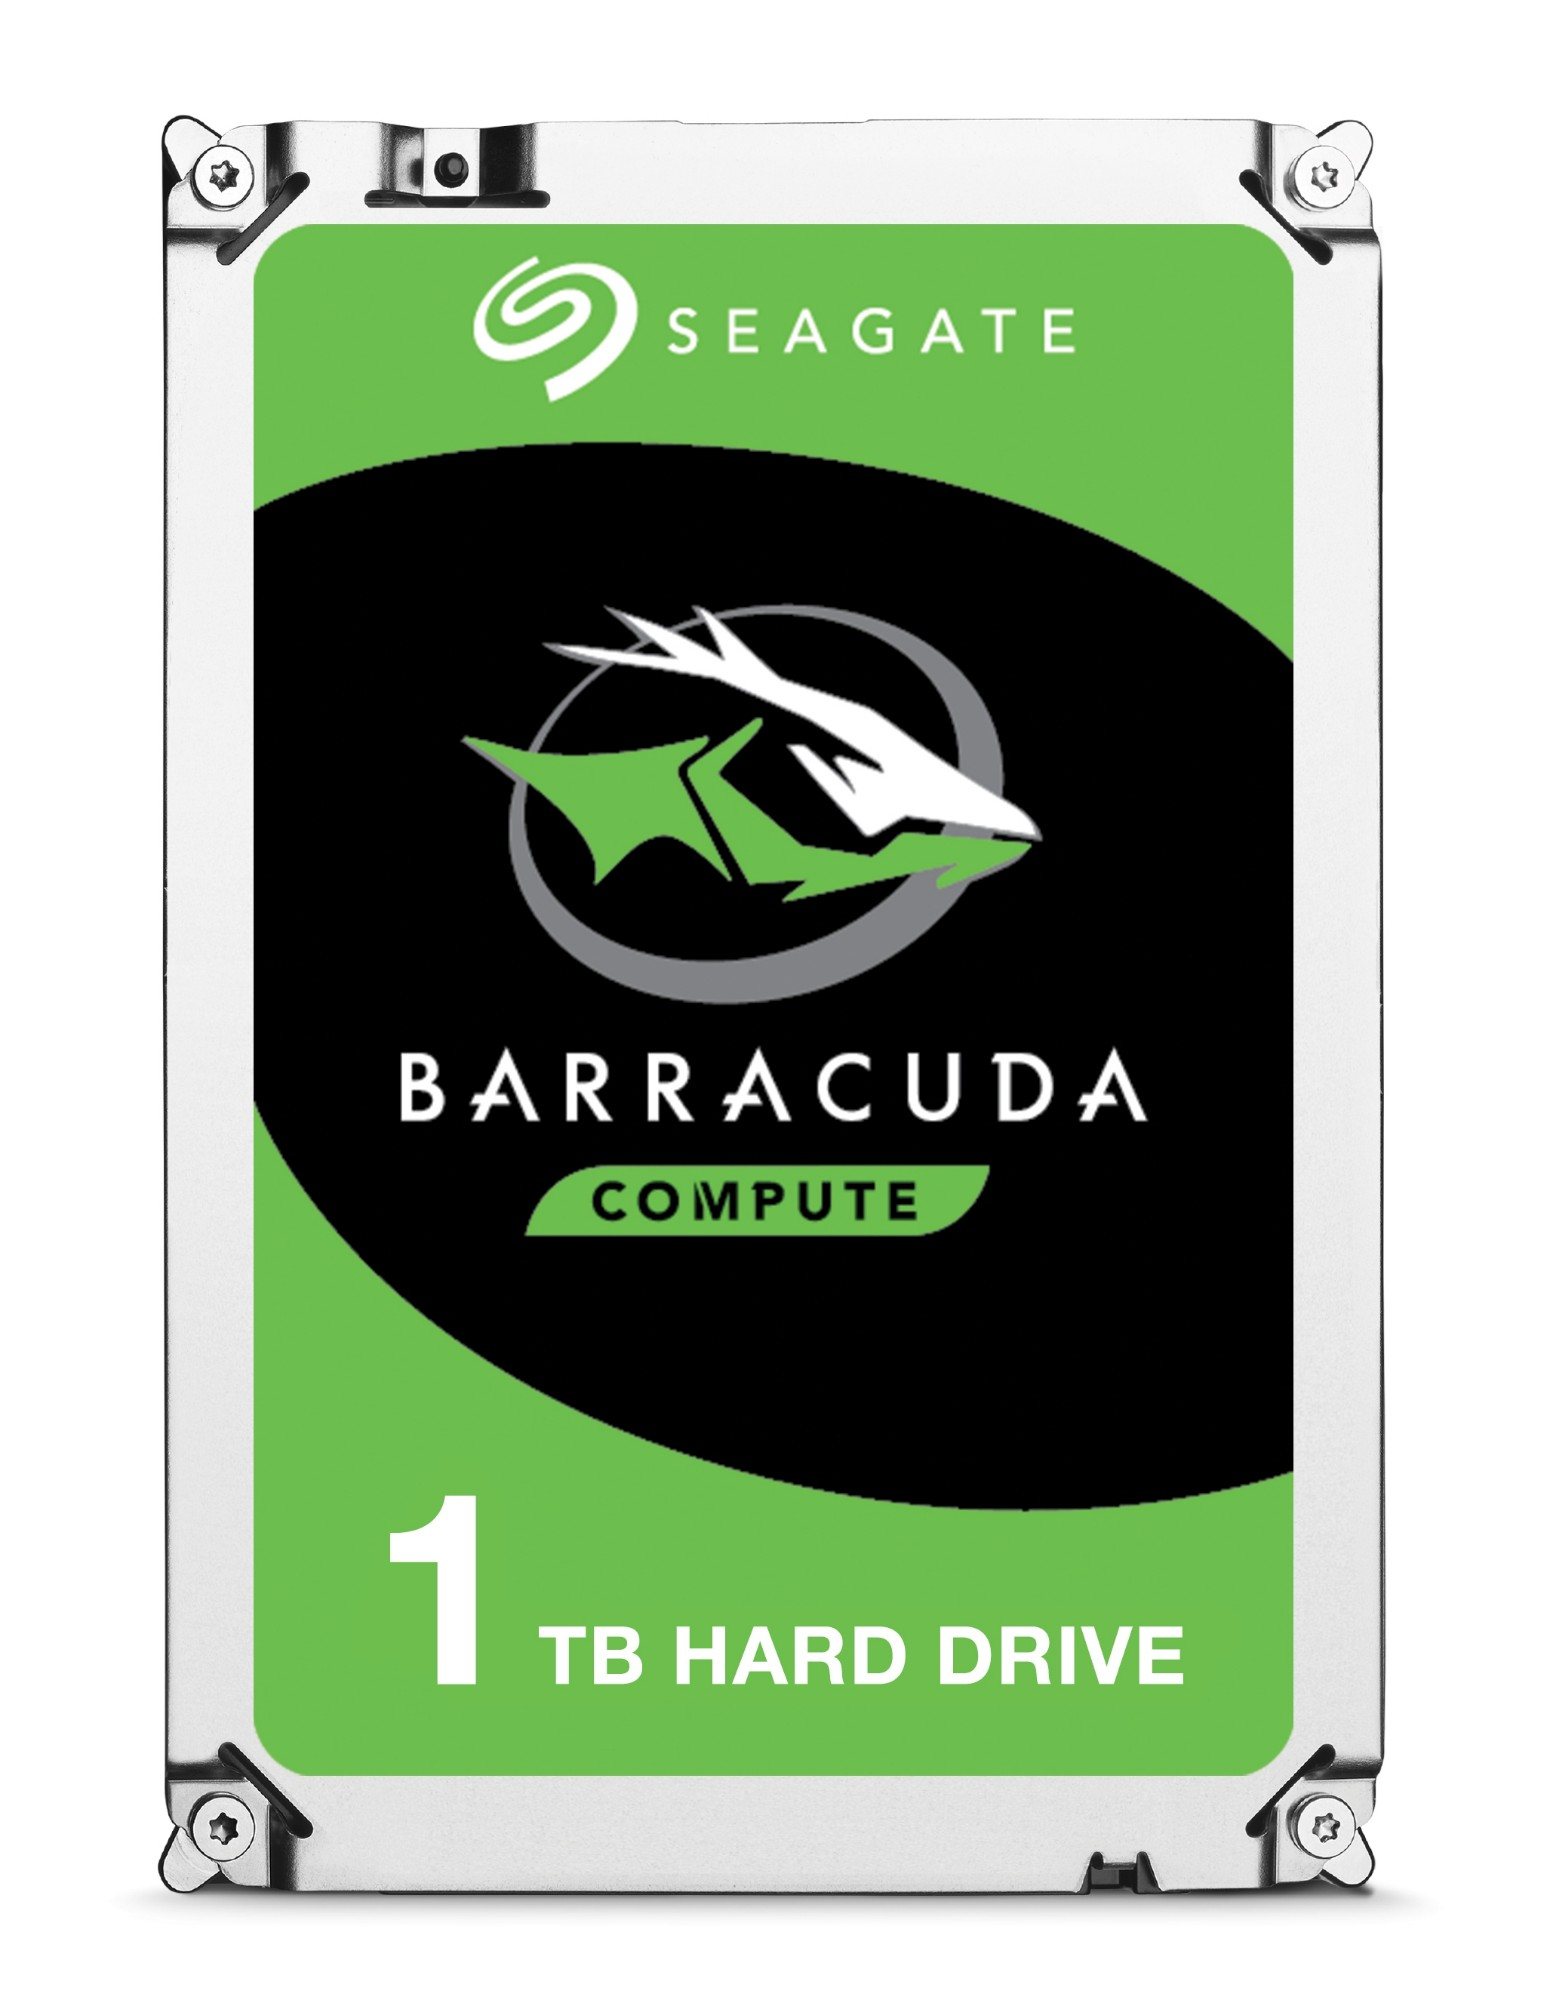 1TB Seagate Barracuda ST1000DM010 Hard Drive